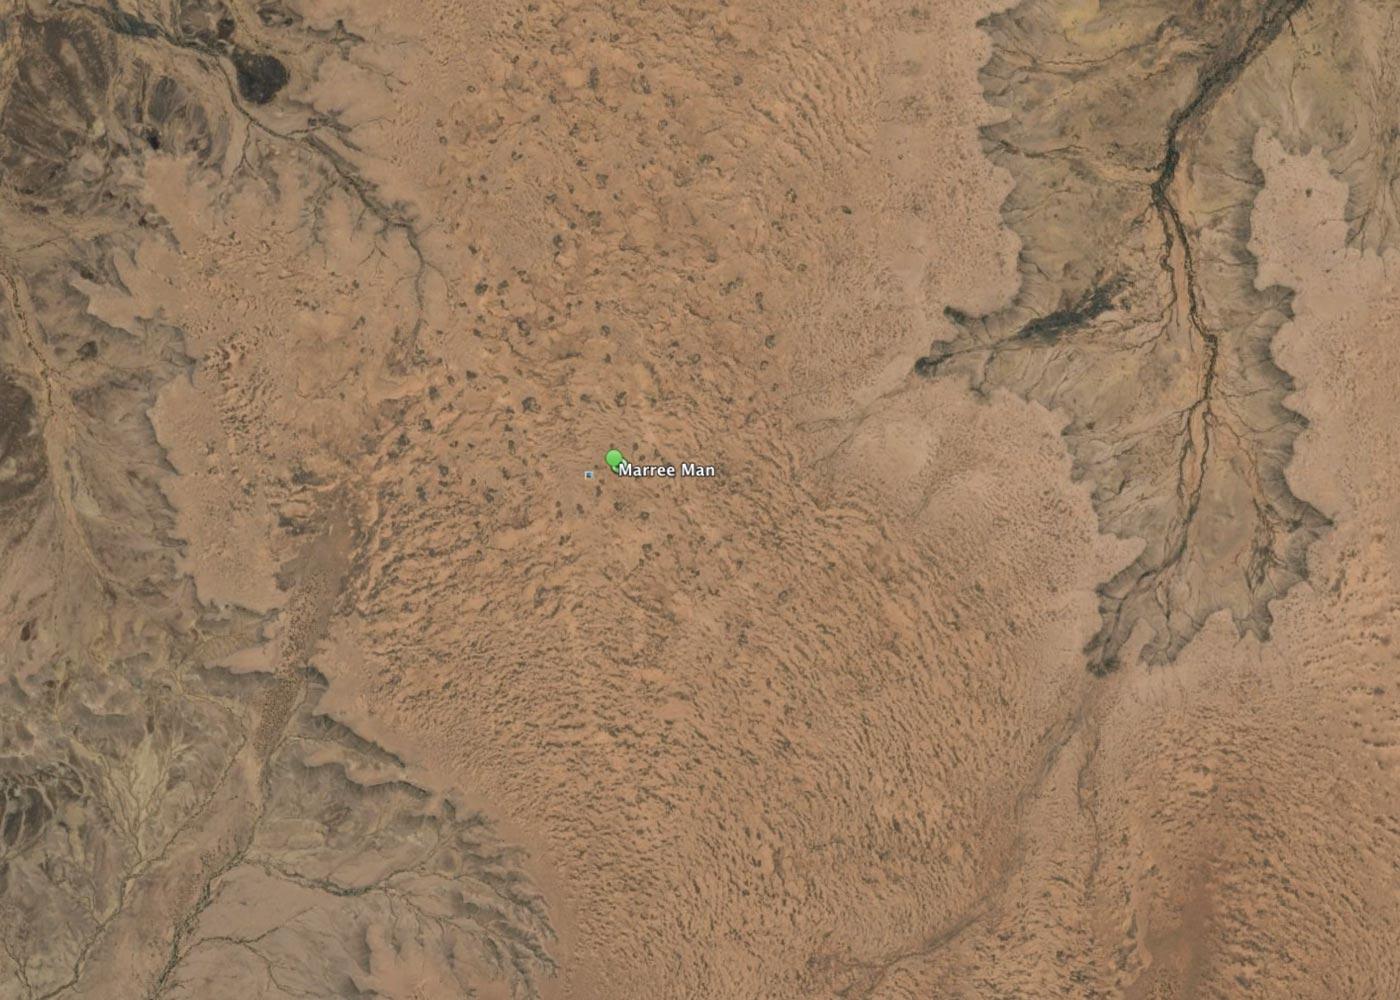 Marree-Man-Faded-Google-earth